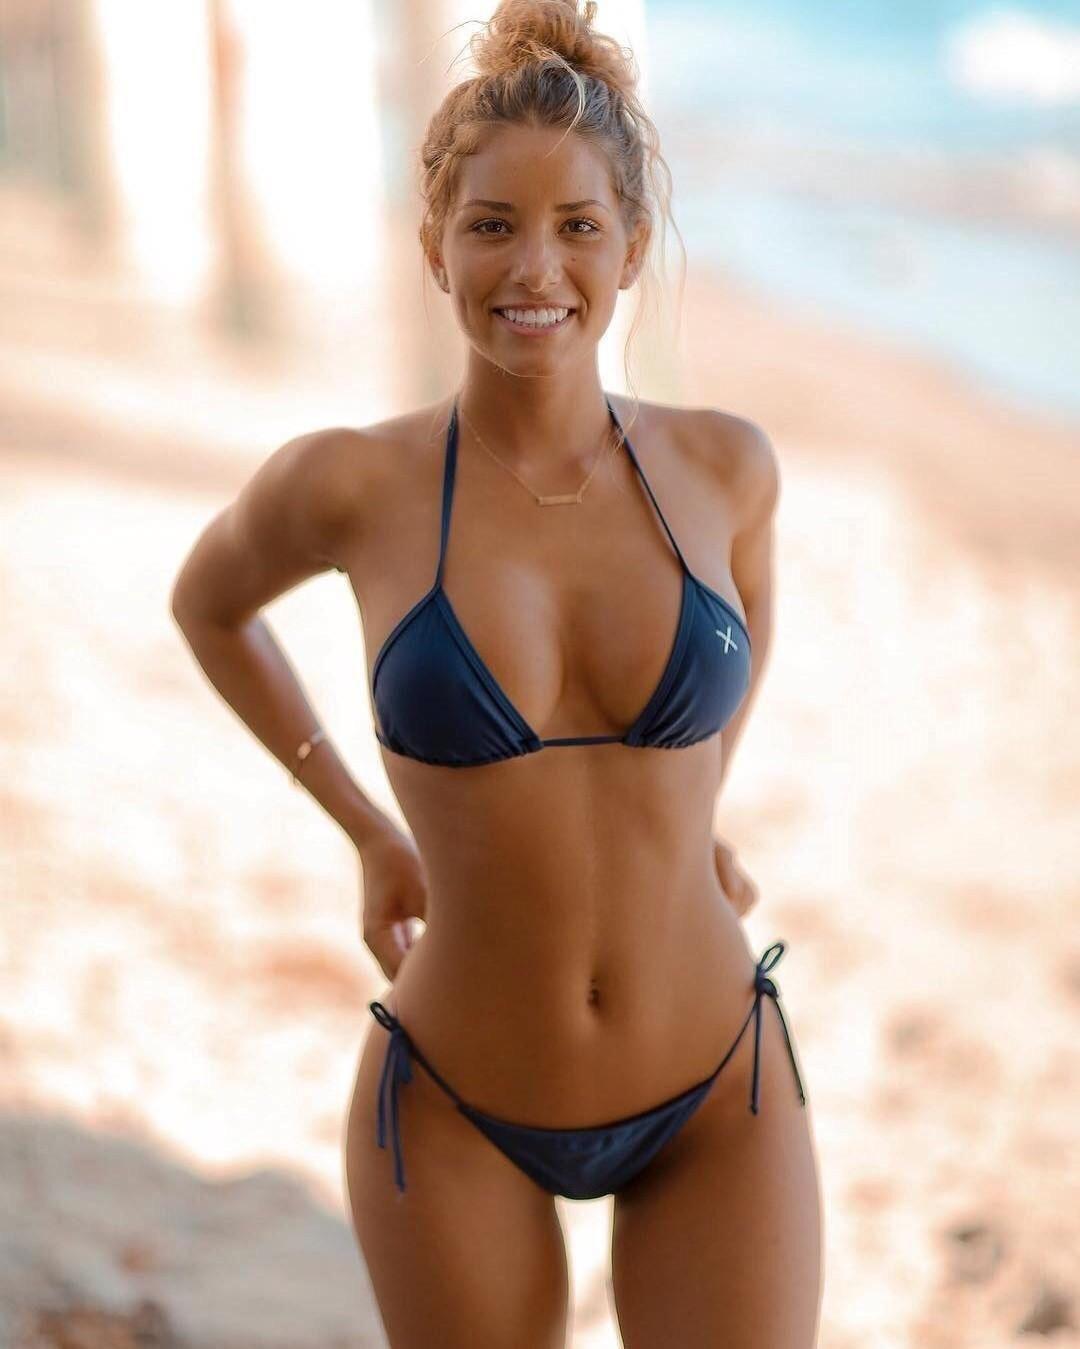 Tits Bikini Sierra Skye  nude (84 fotos), 2019, bra